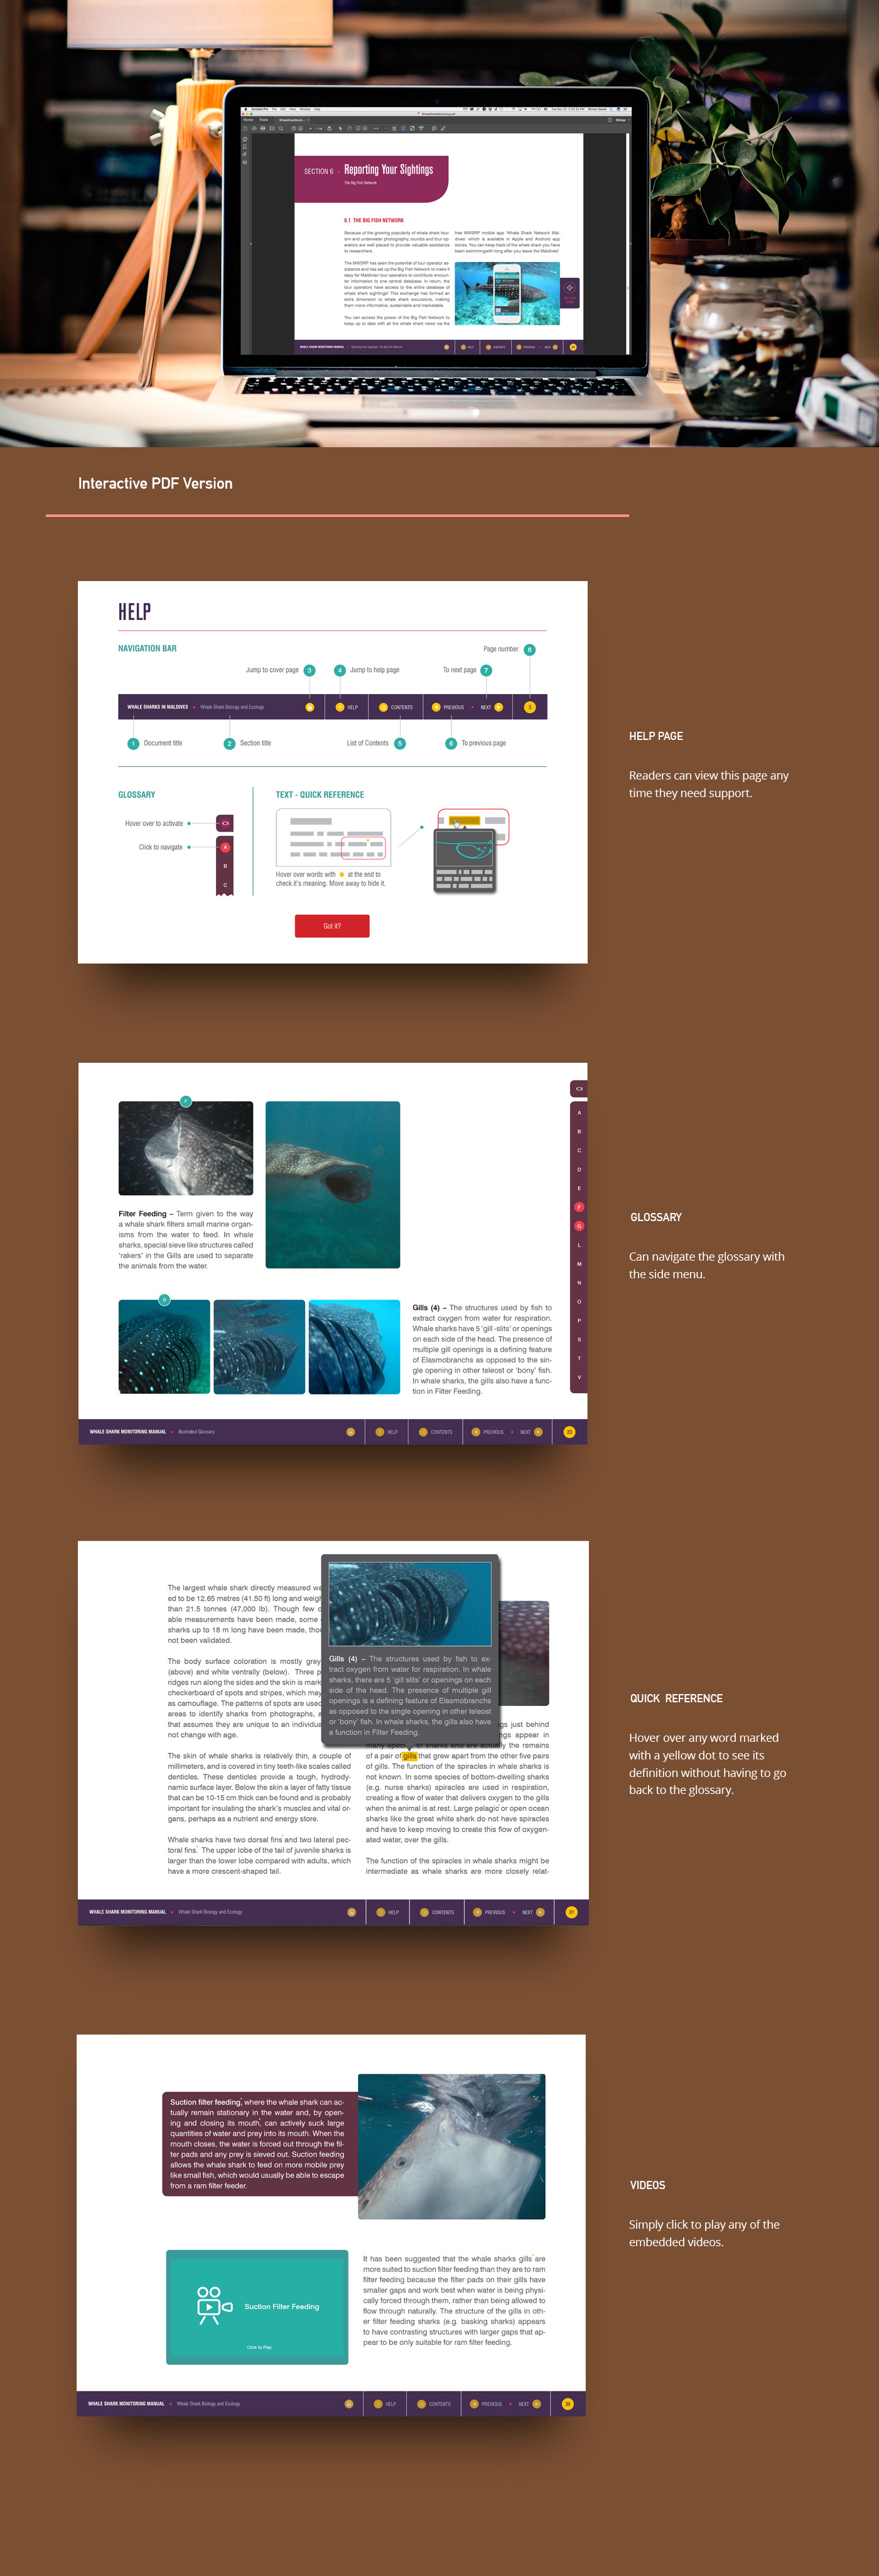 whale shark Maldives manual shinaz Interactive PDF iBook kindle report Layout publishing